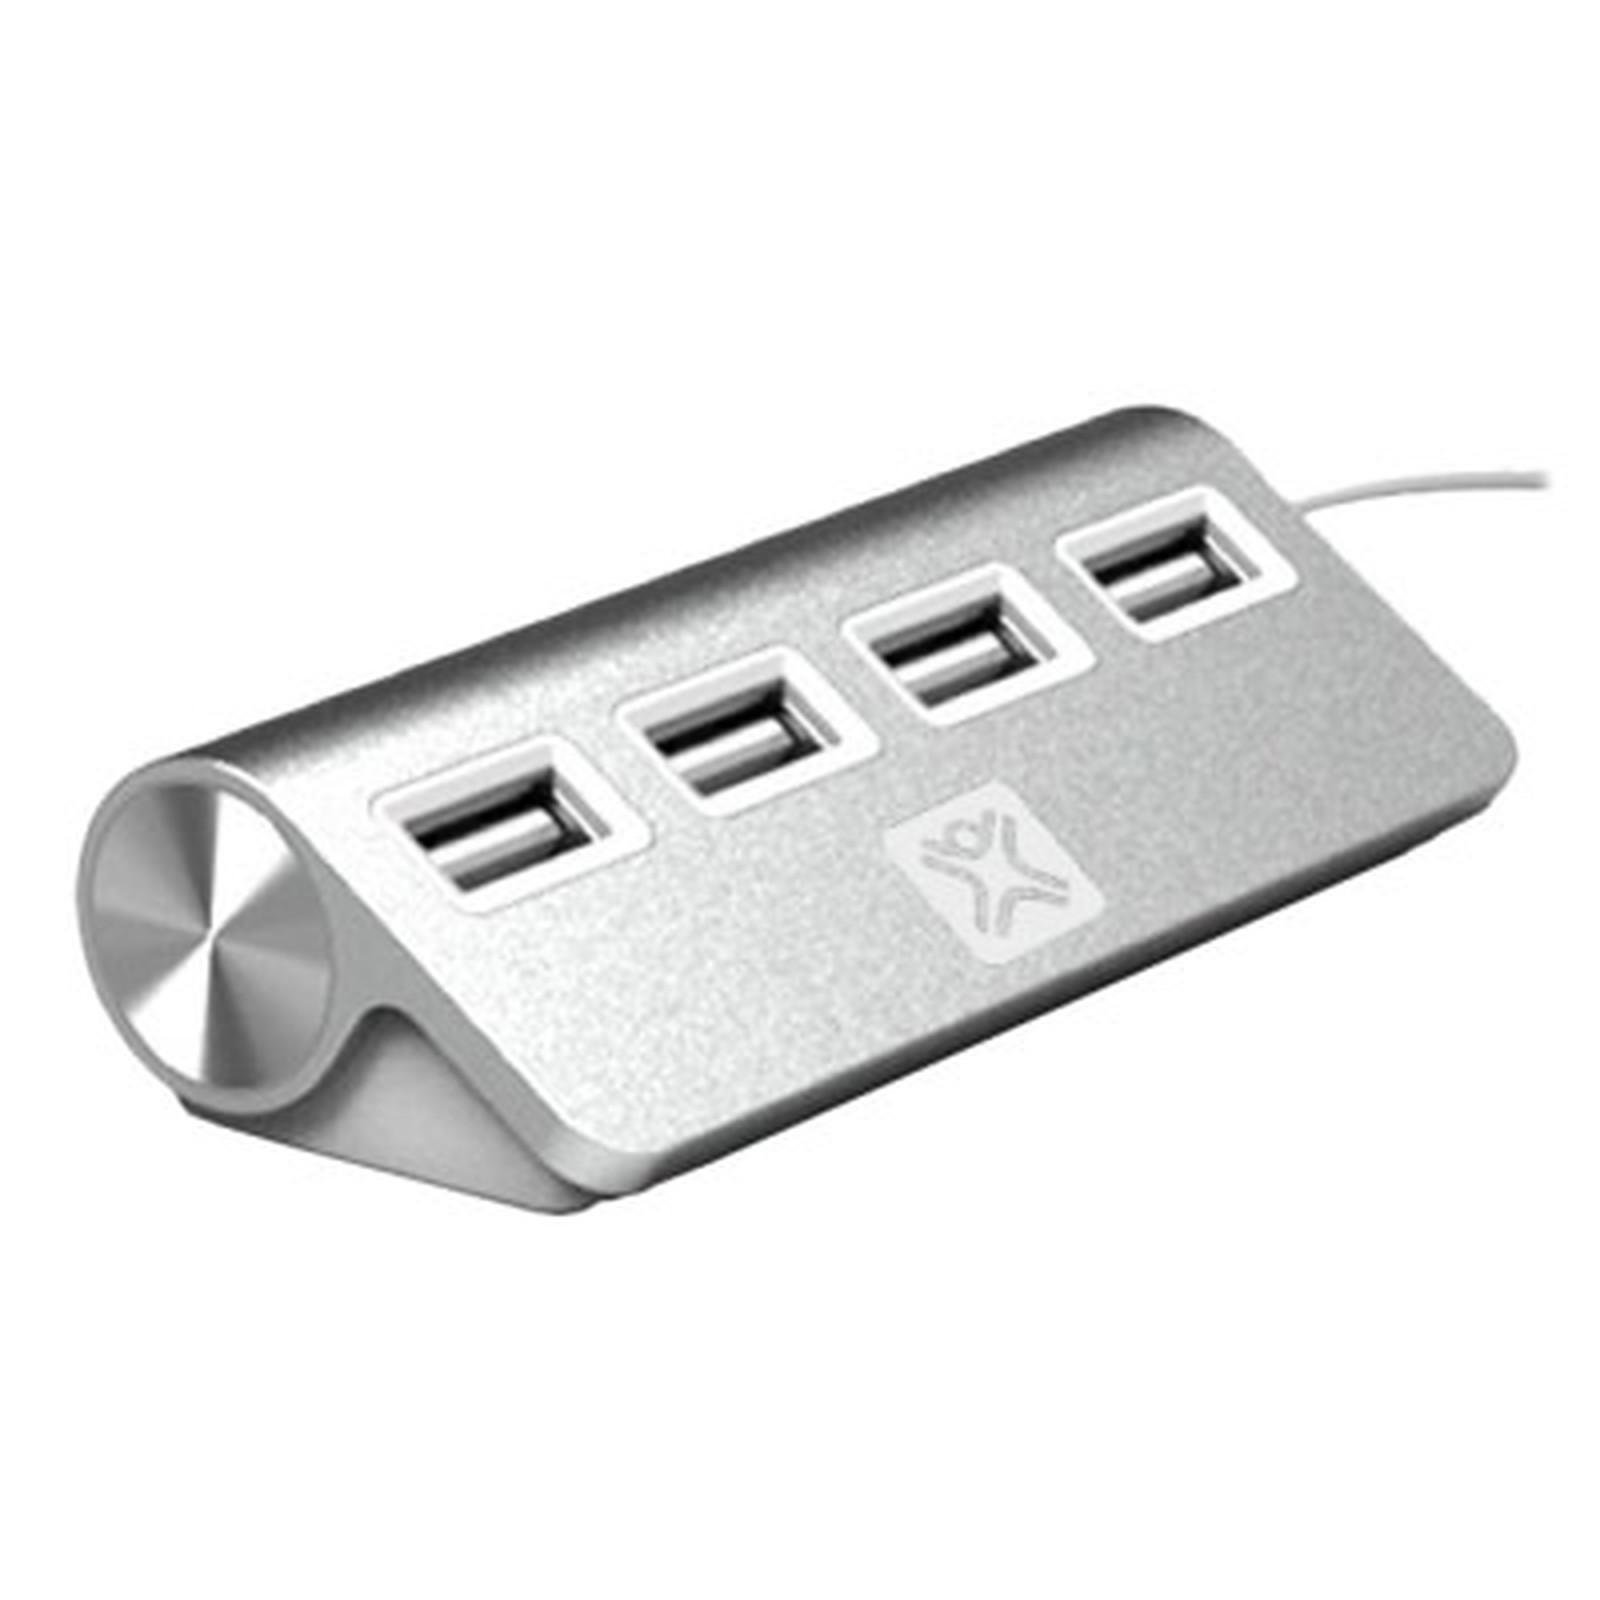 XtremeMac Hub USB 2.0 4 ports